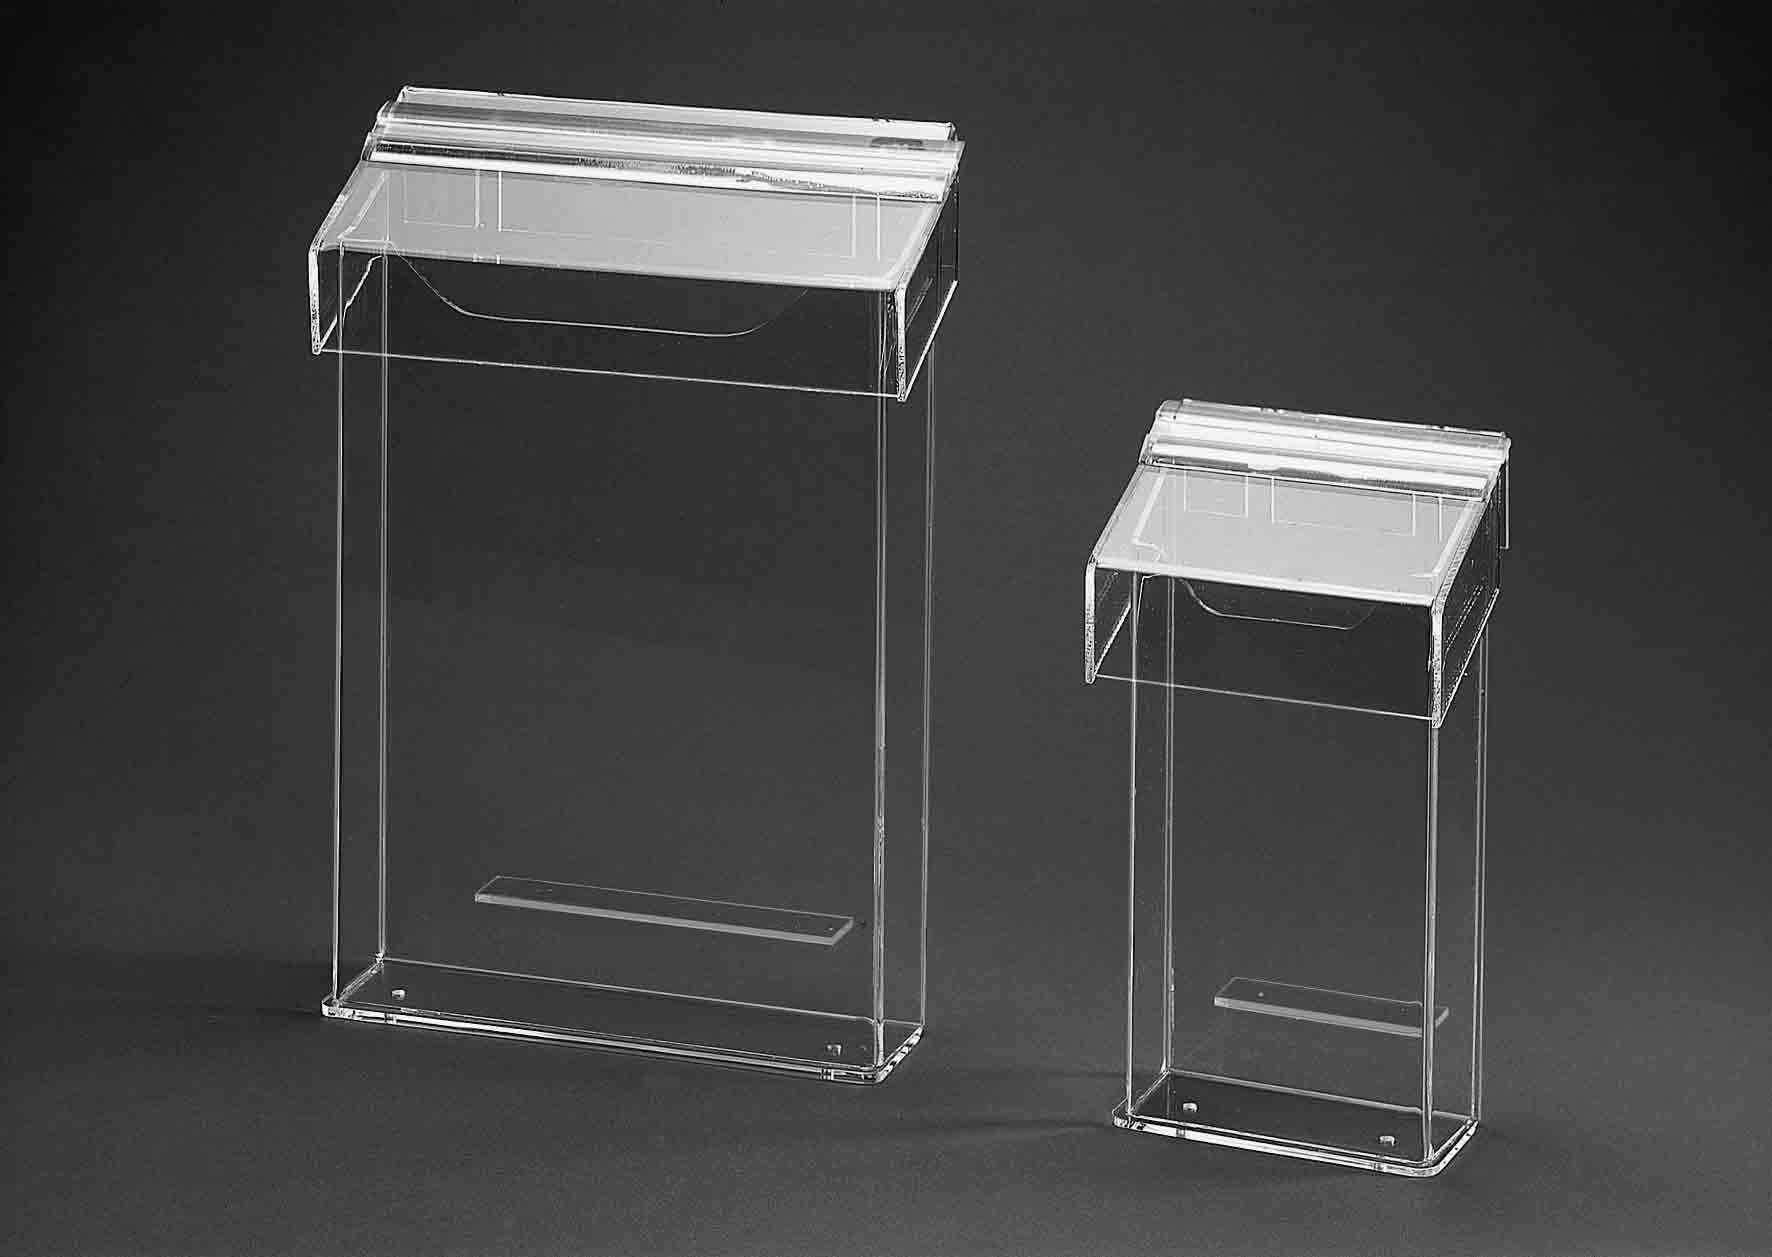 prospektst nder aus plexiglas. Black Bedroom Furniture Sets. Home Design Ideas